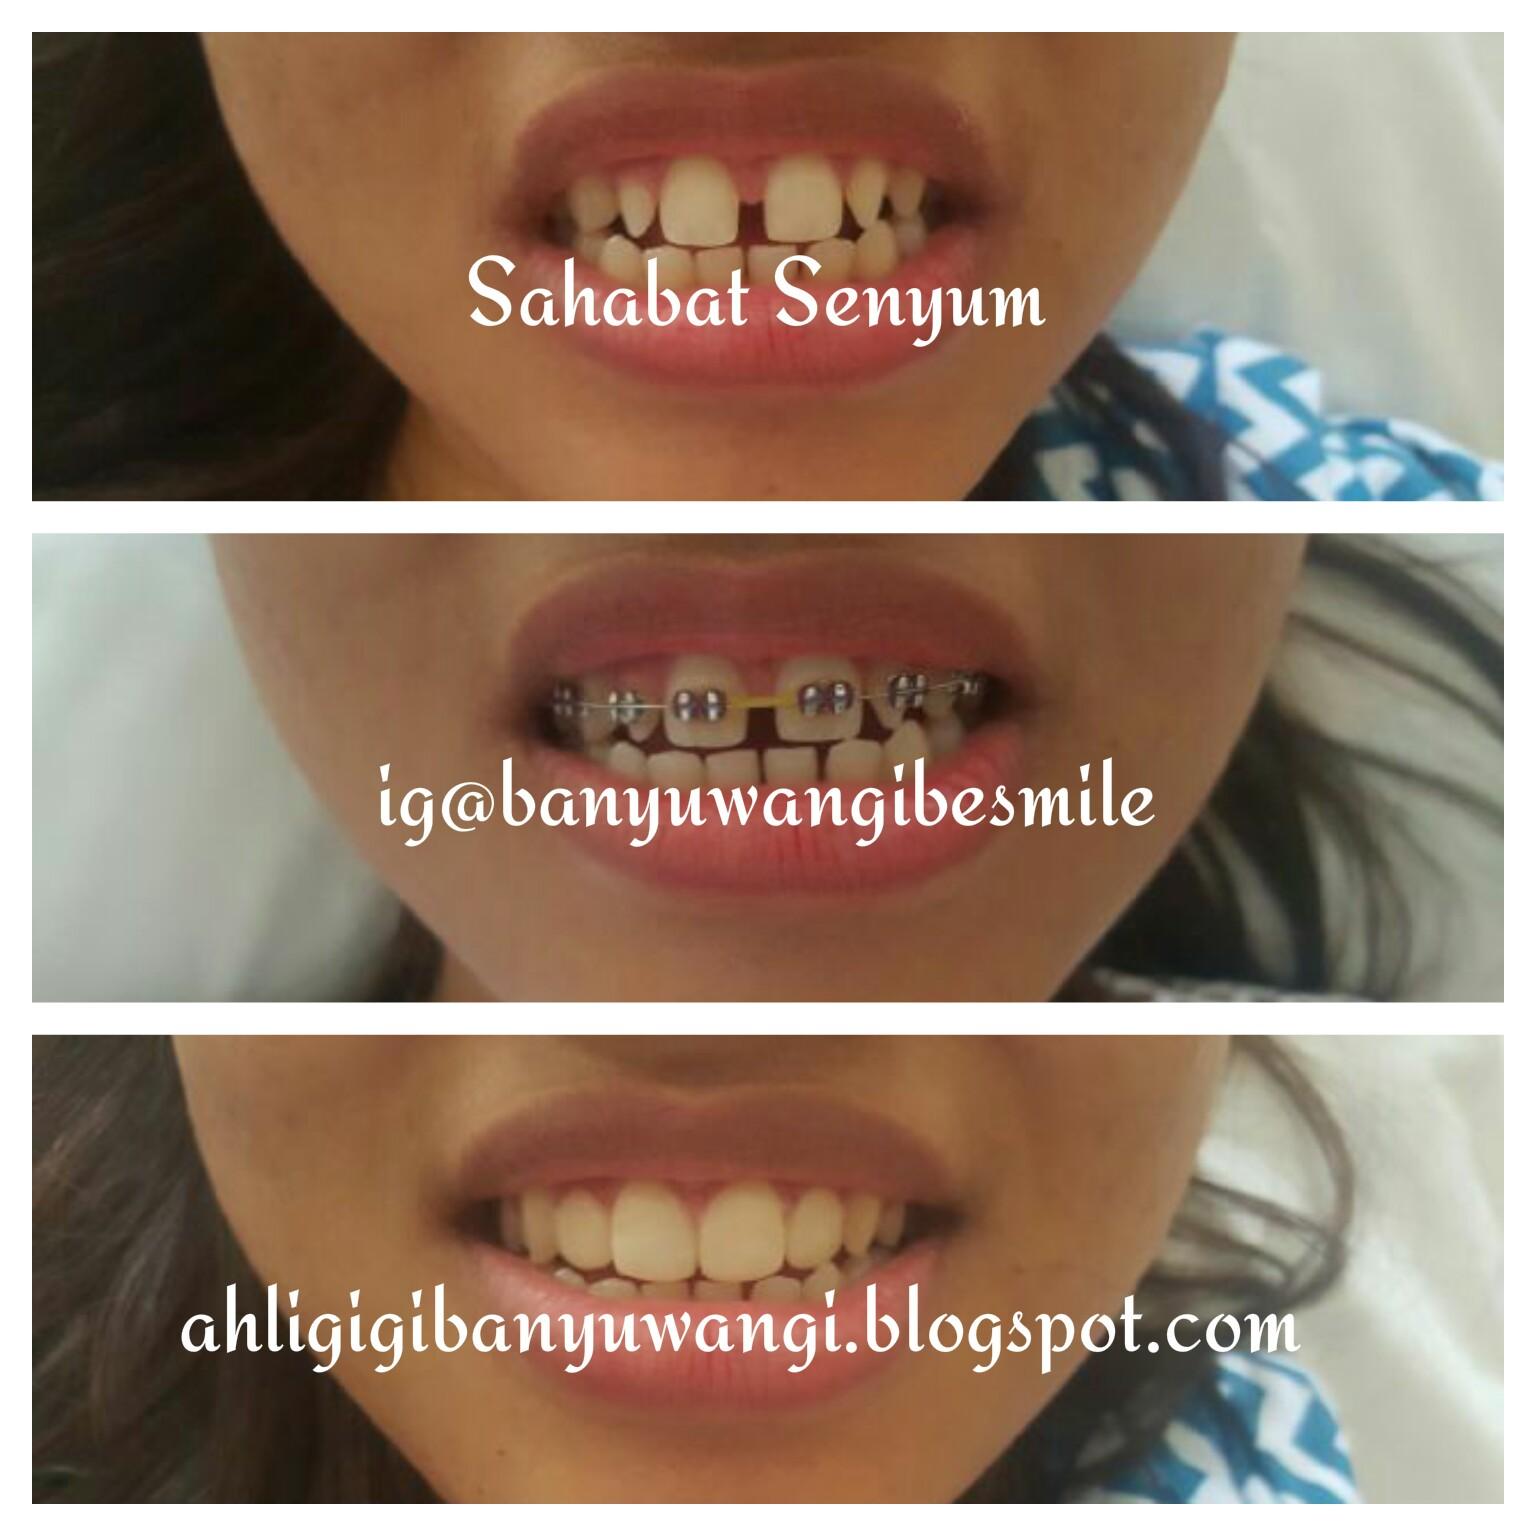 Merapatkan Gigi Dengan Behel Kawat Gigi Ahli Gigi Banyuwangi